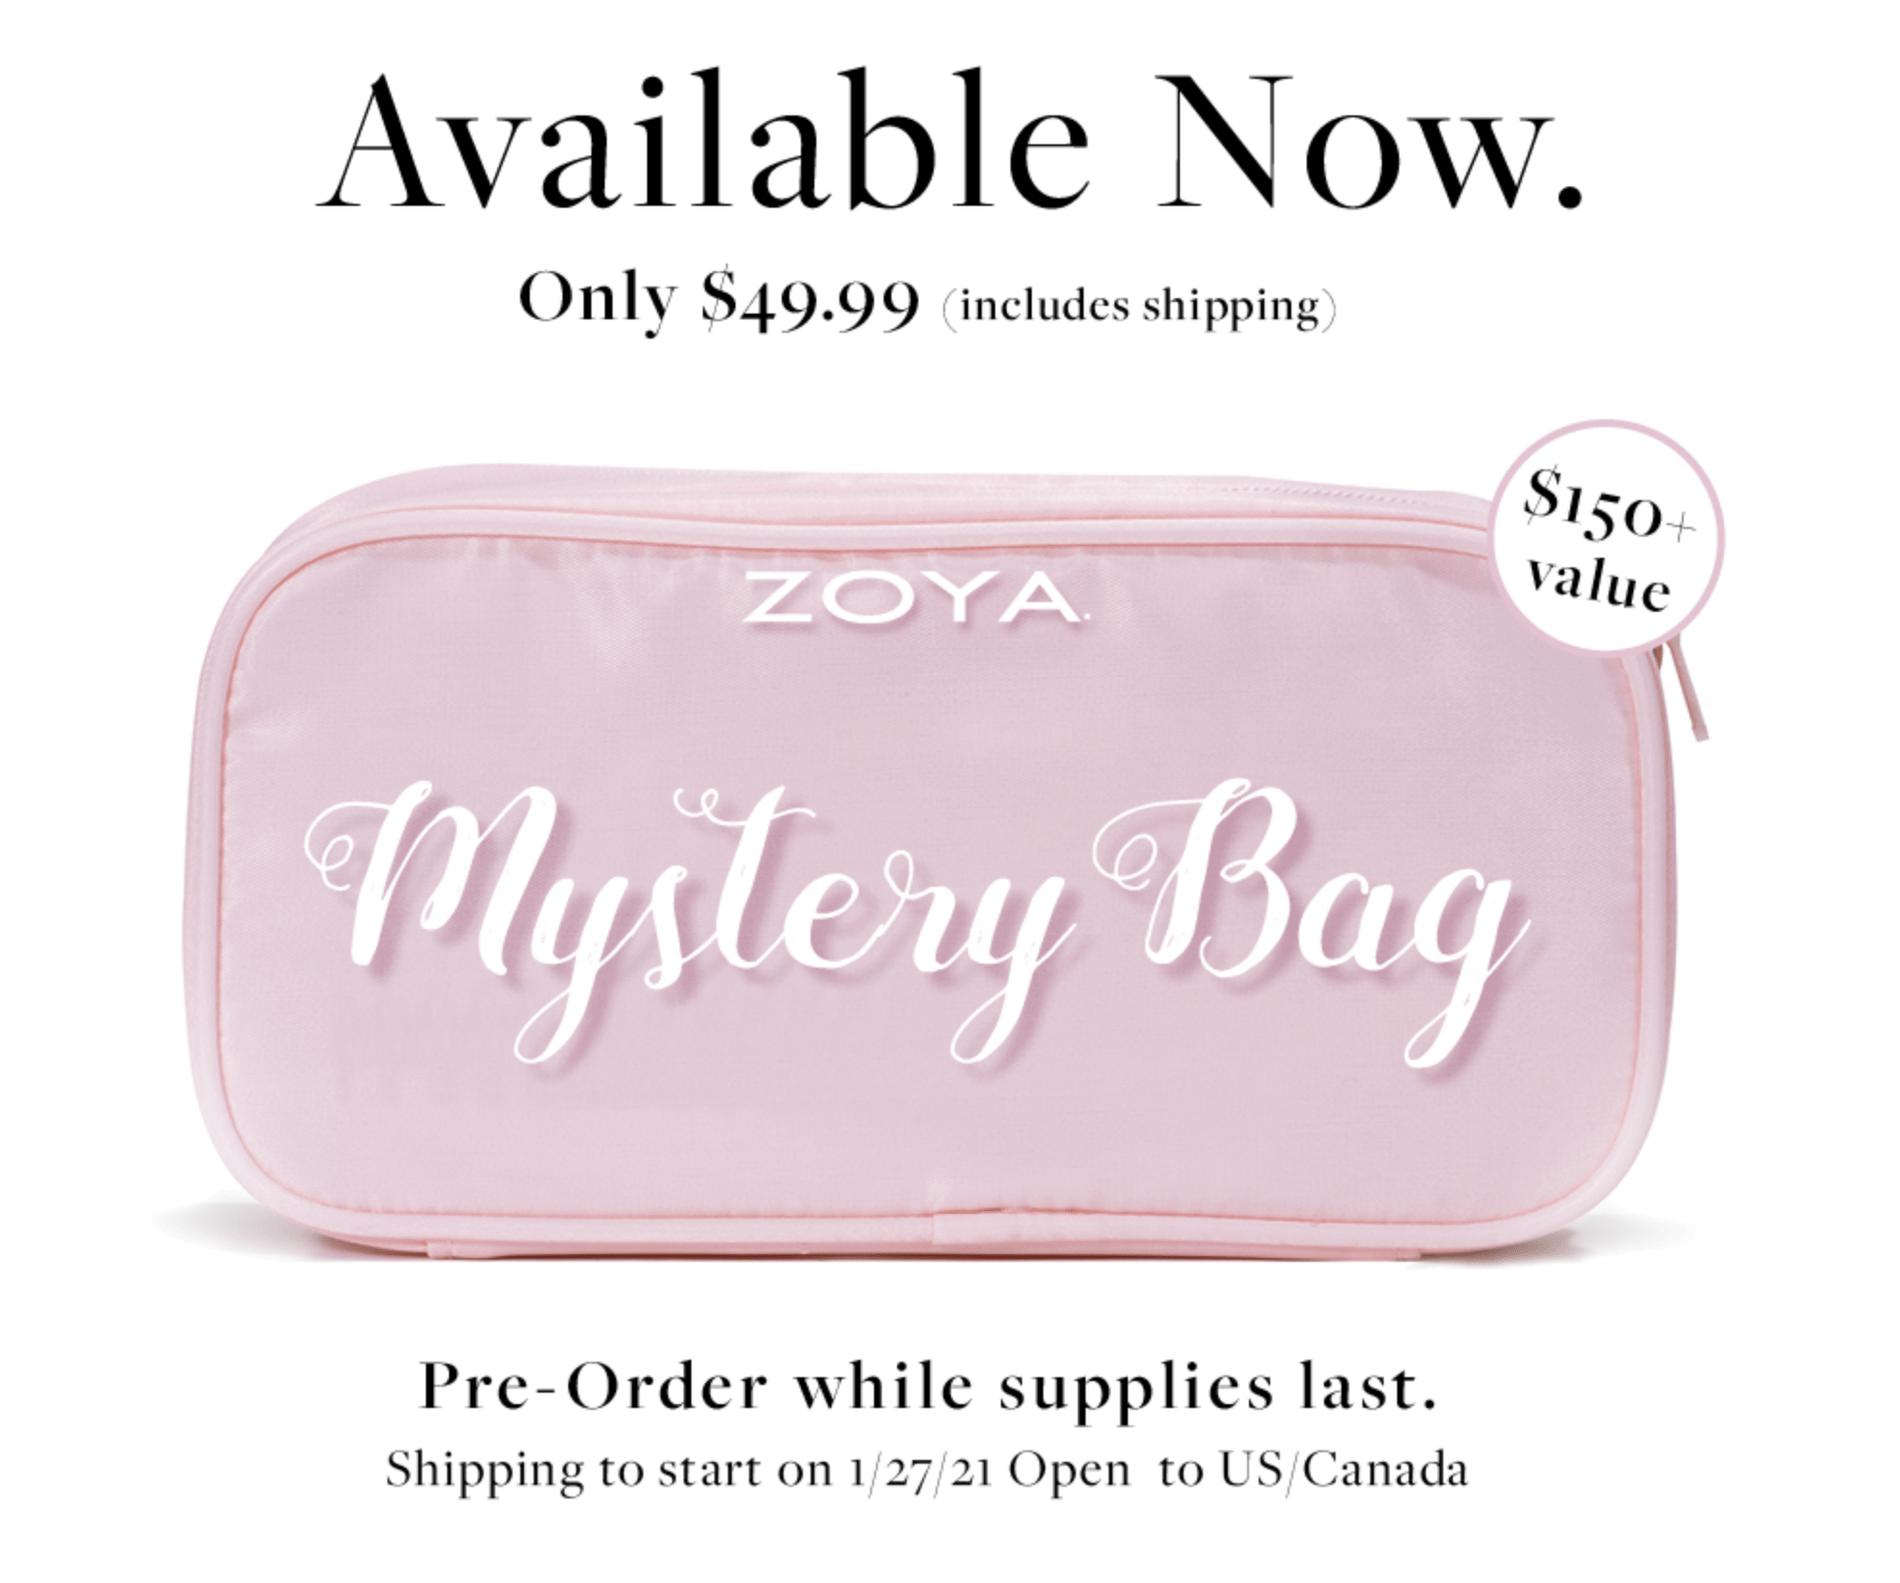 Zoya Mystery Box – On Sale Now